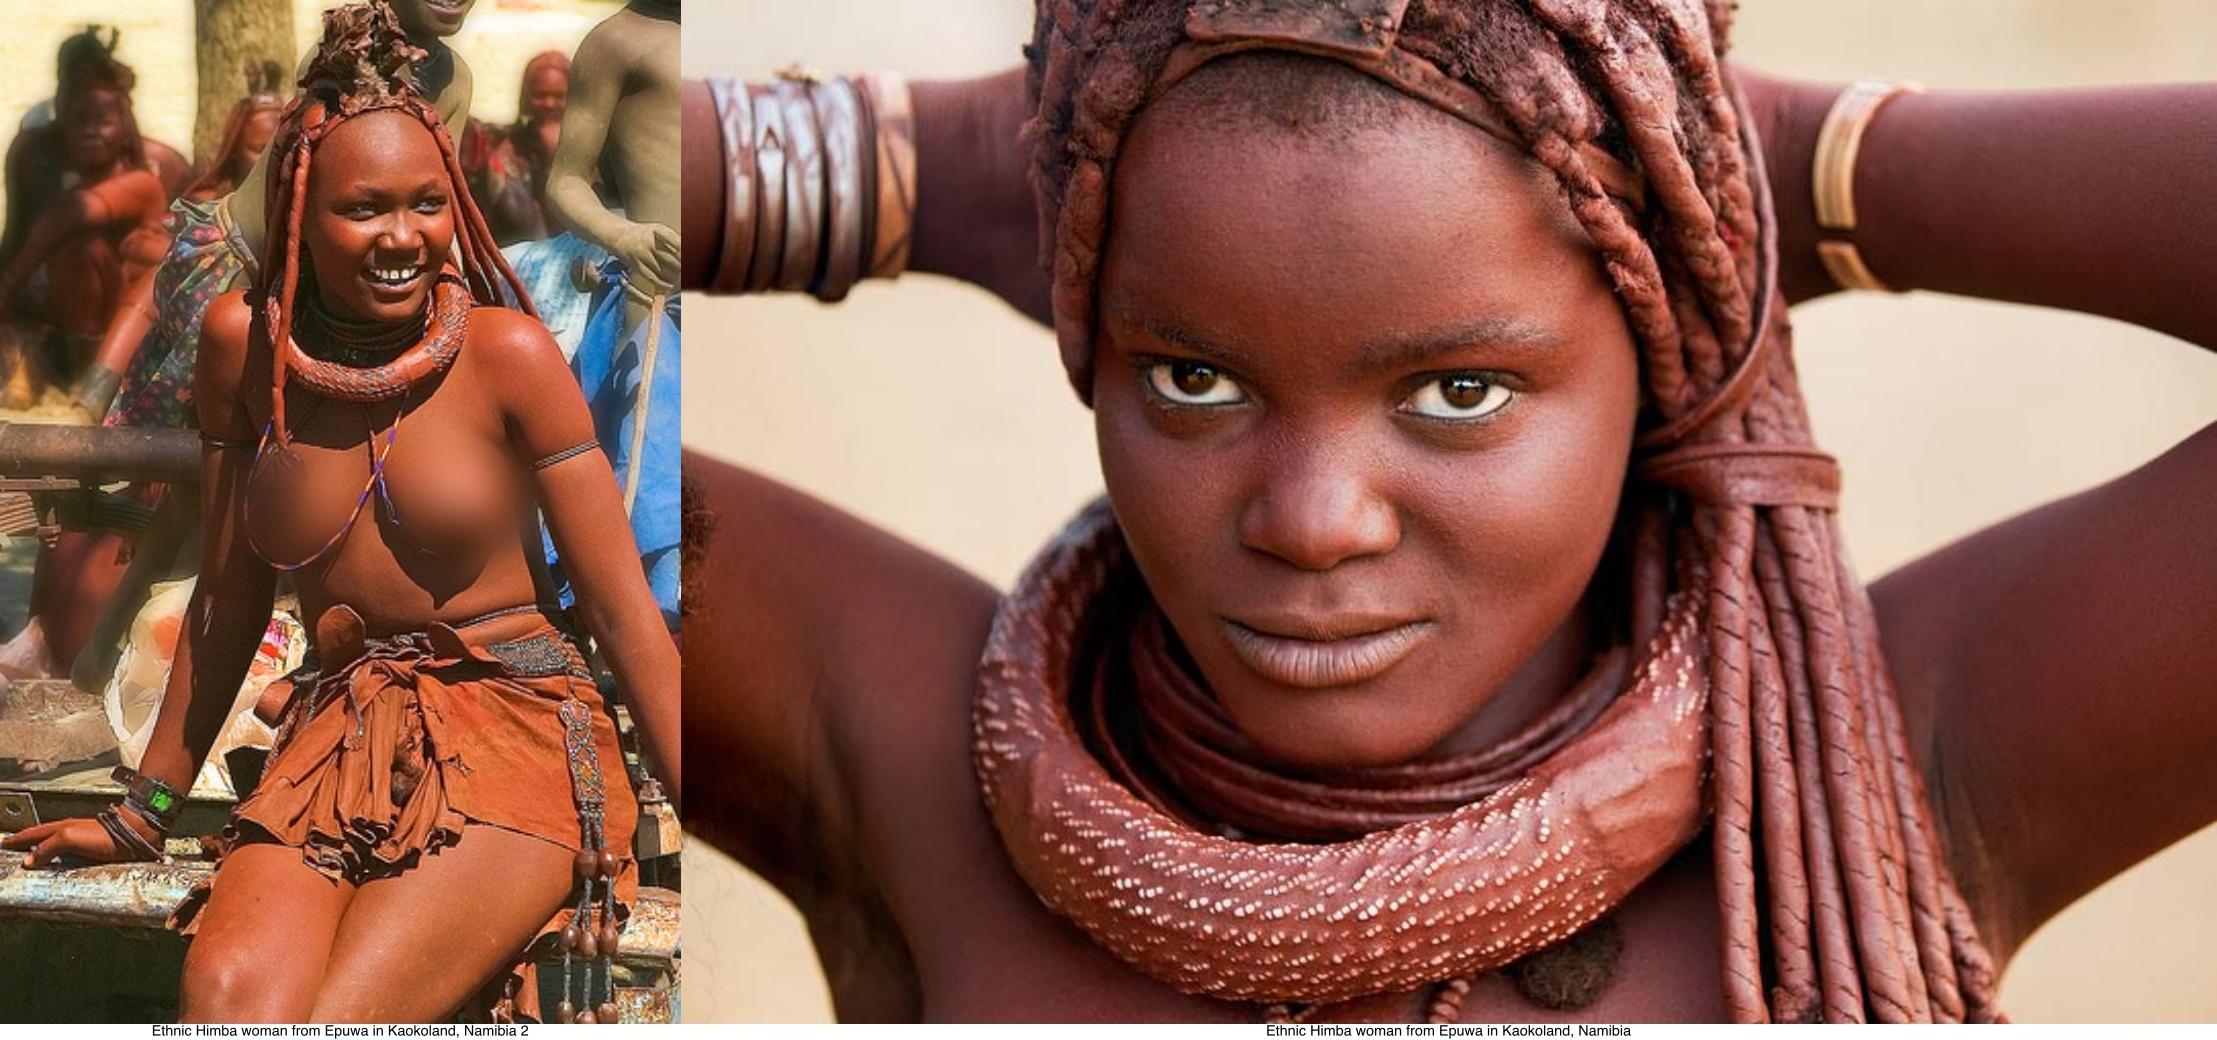 Ethnic Himba woman from Epuwa in Kaokoland, Namibia with